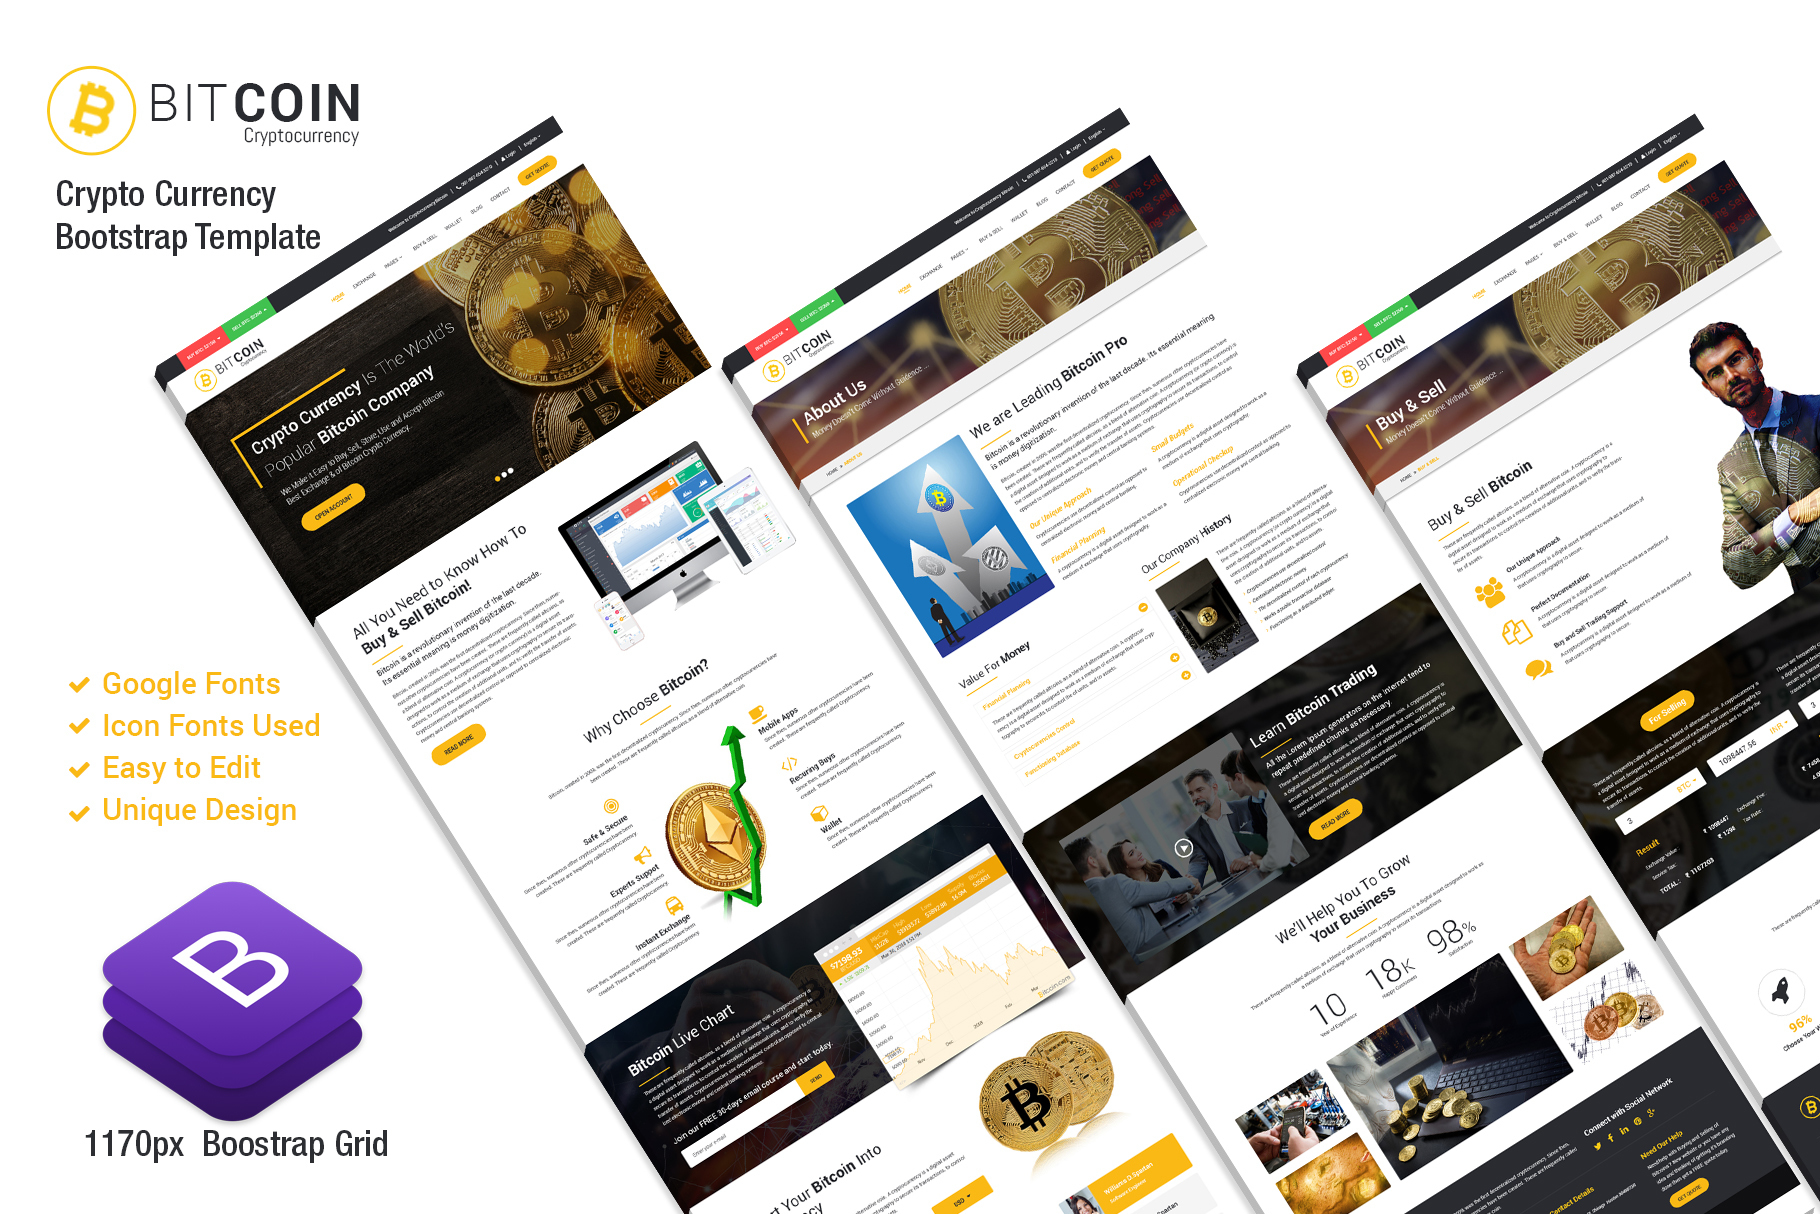 BitCoin-Responsive Website Template